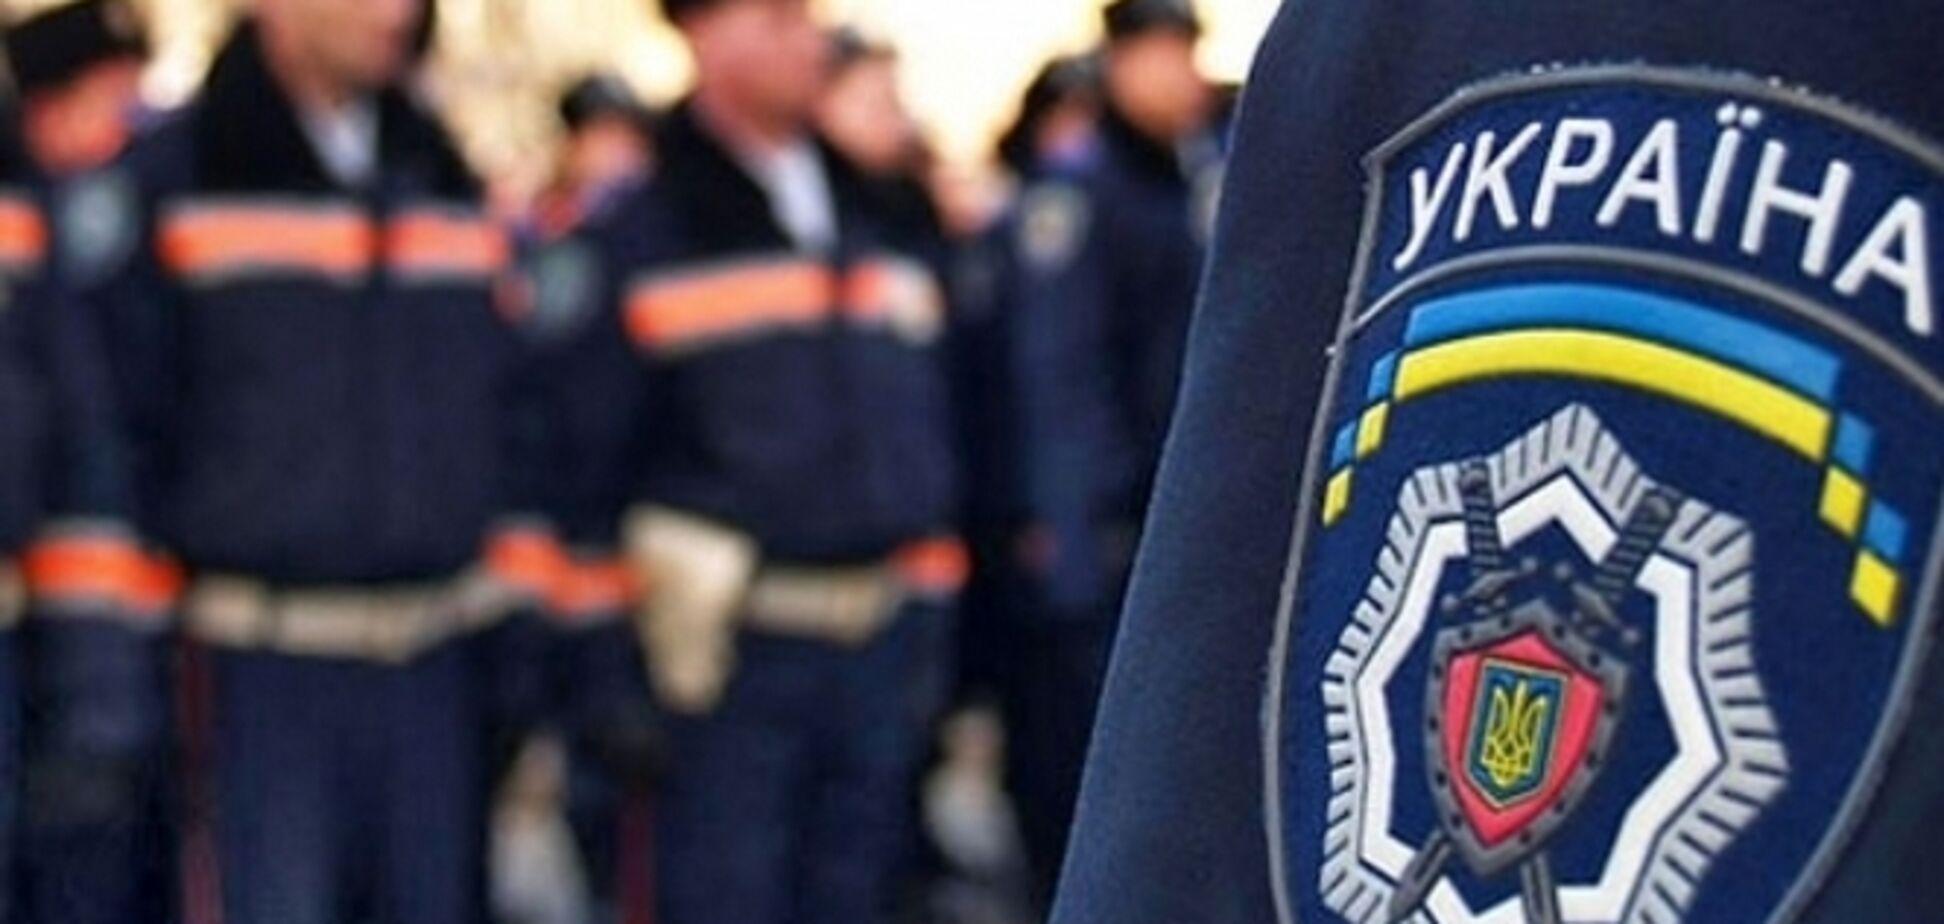 Прокурор уличил МВД в позорном антирекорде